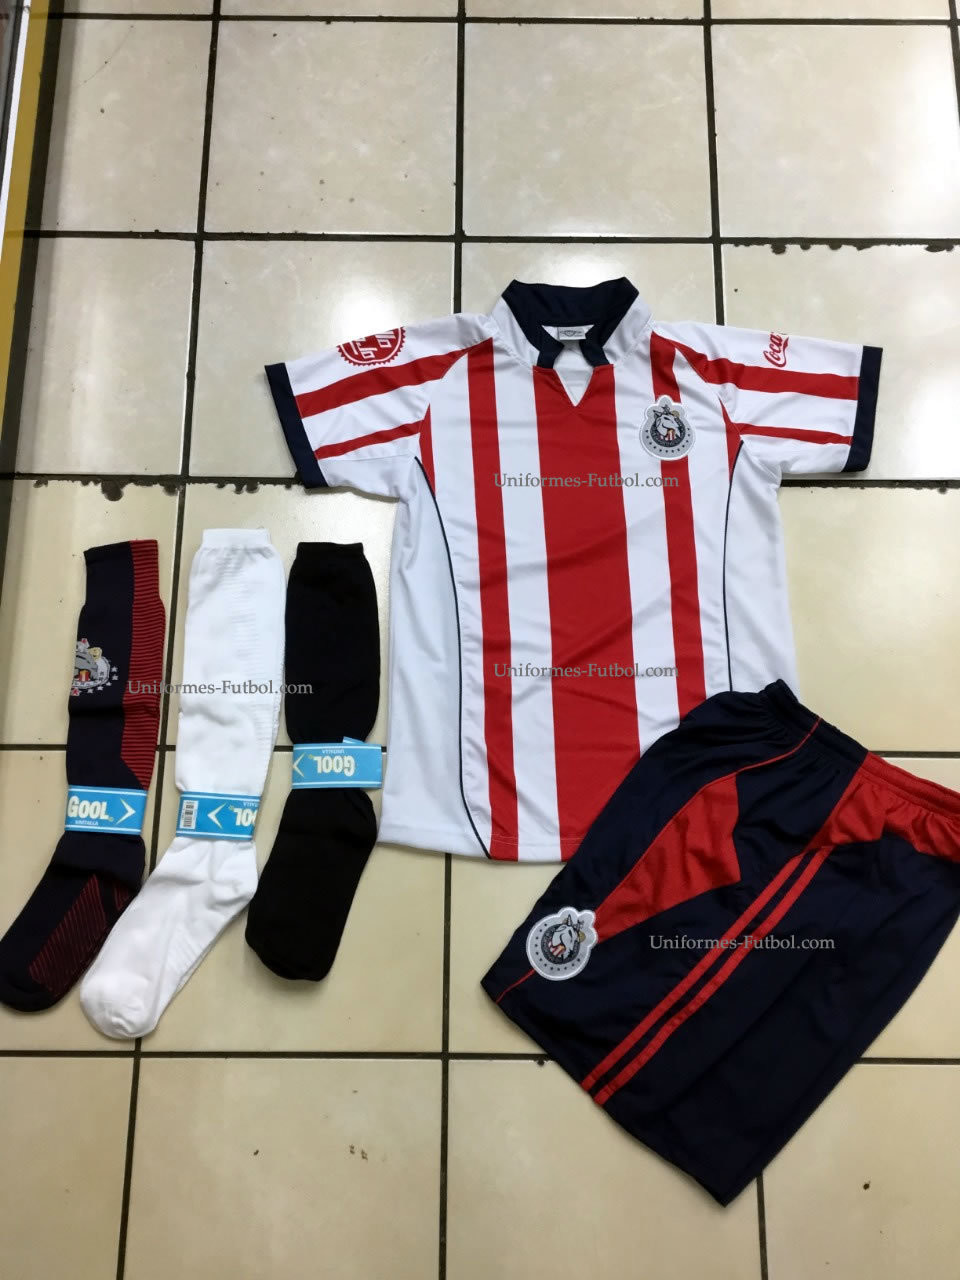 Uniforme de Futbol  Local Chivas